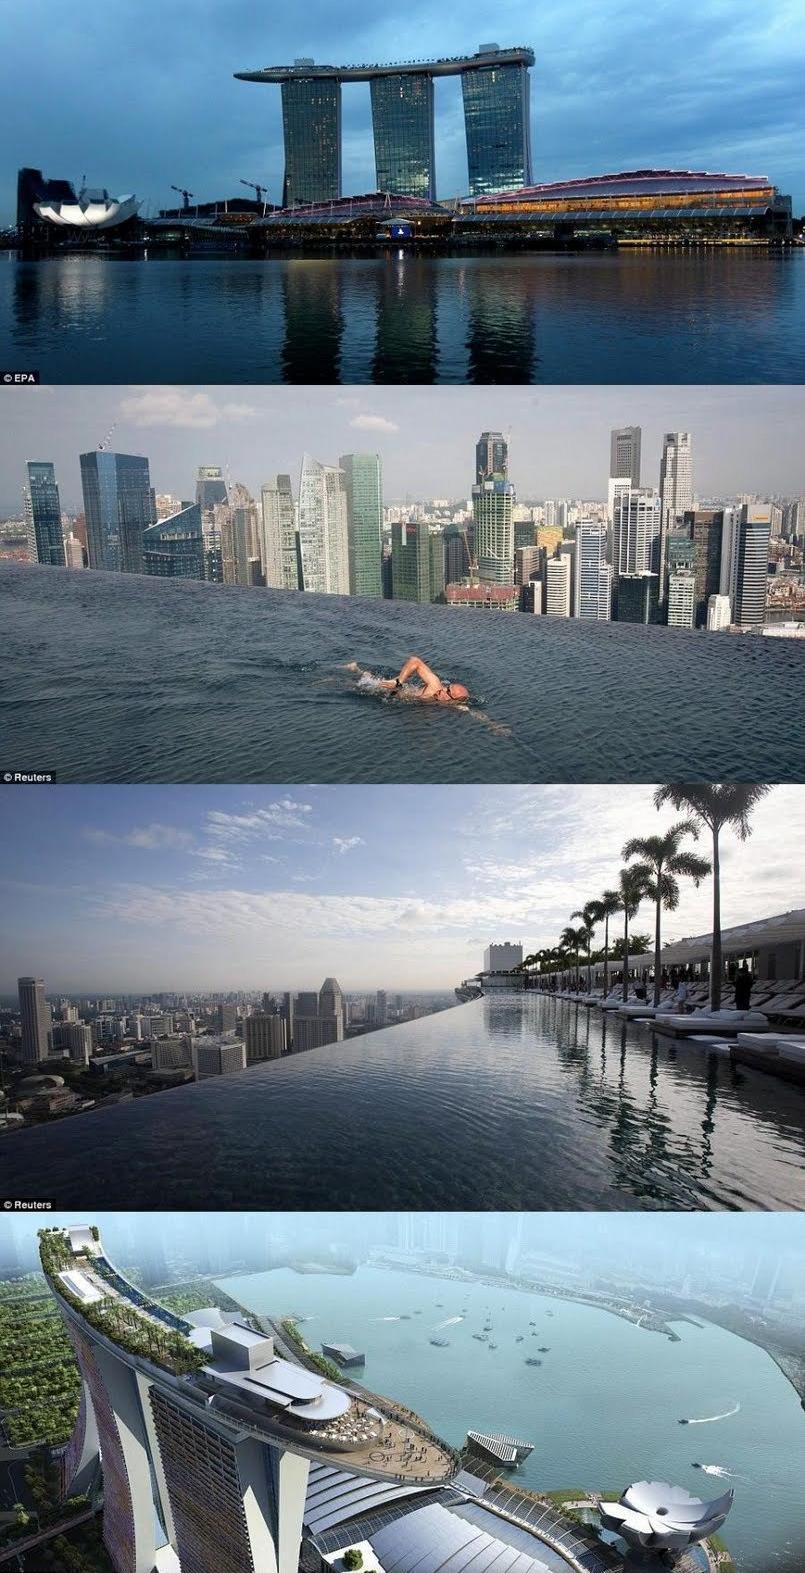 Marina Sands Hotel